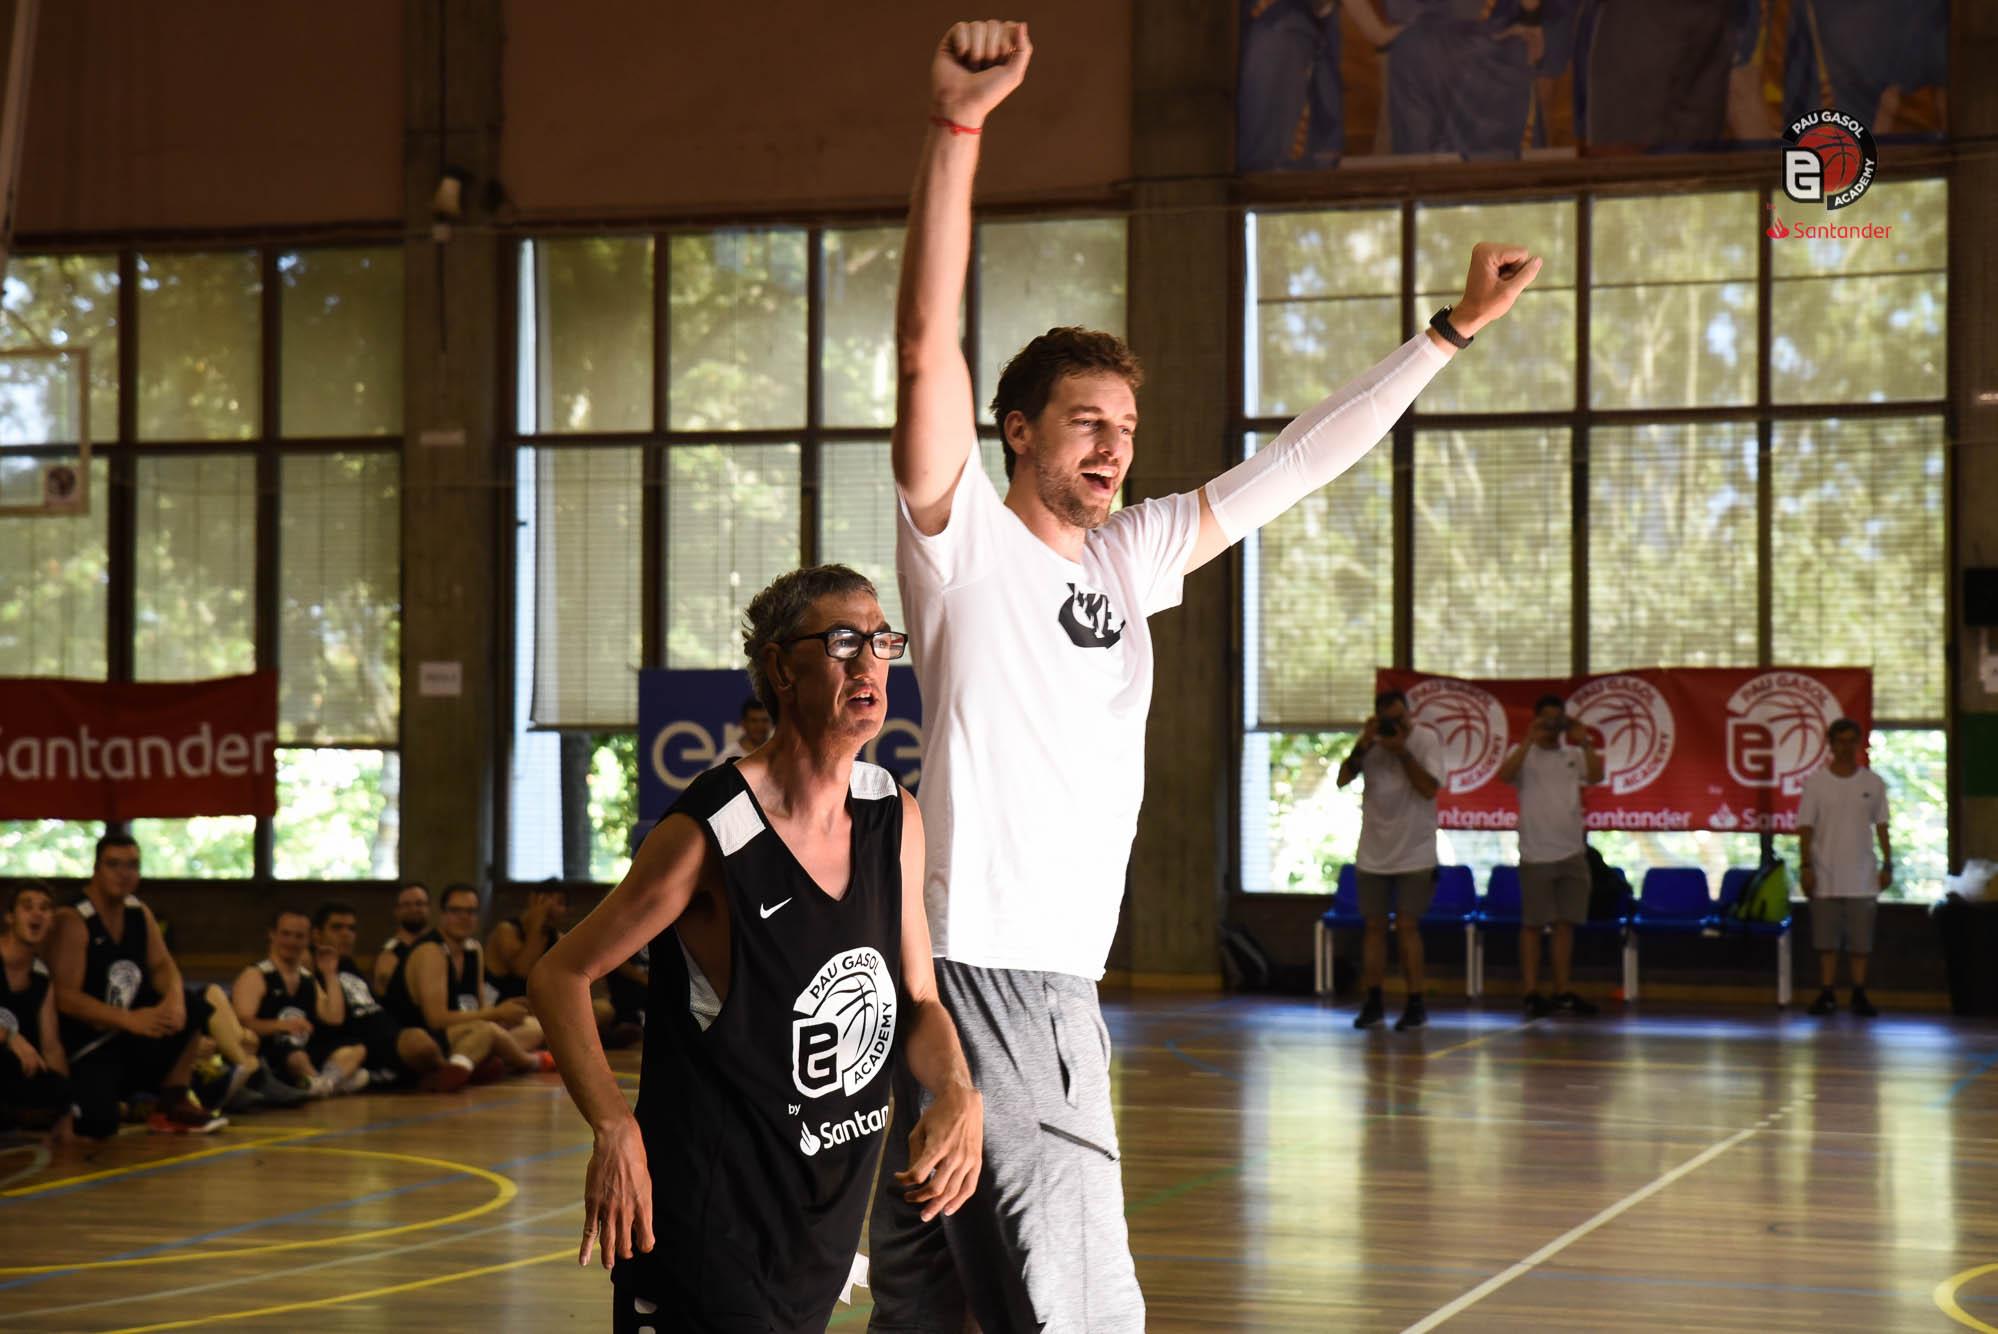 Aniversari Pau Gasol + Partit Jimmy Butler Amb Special Olympics